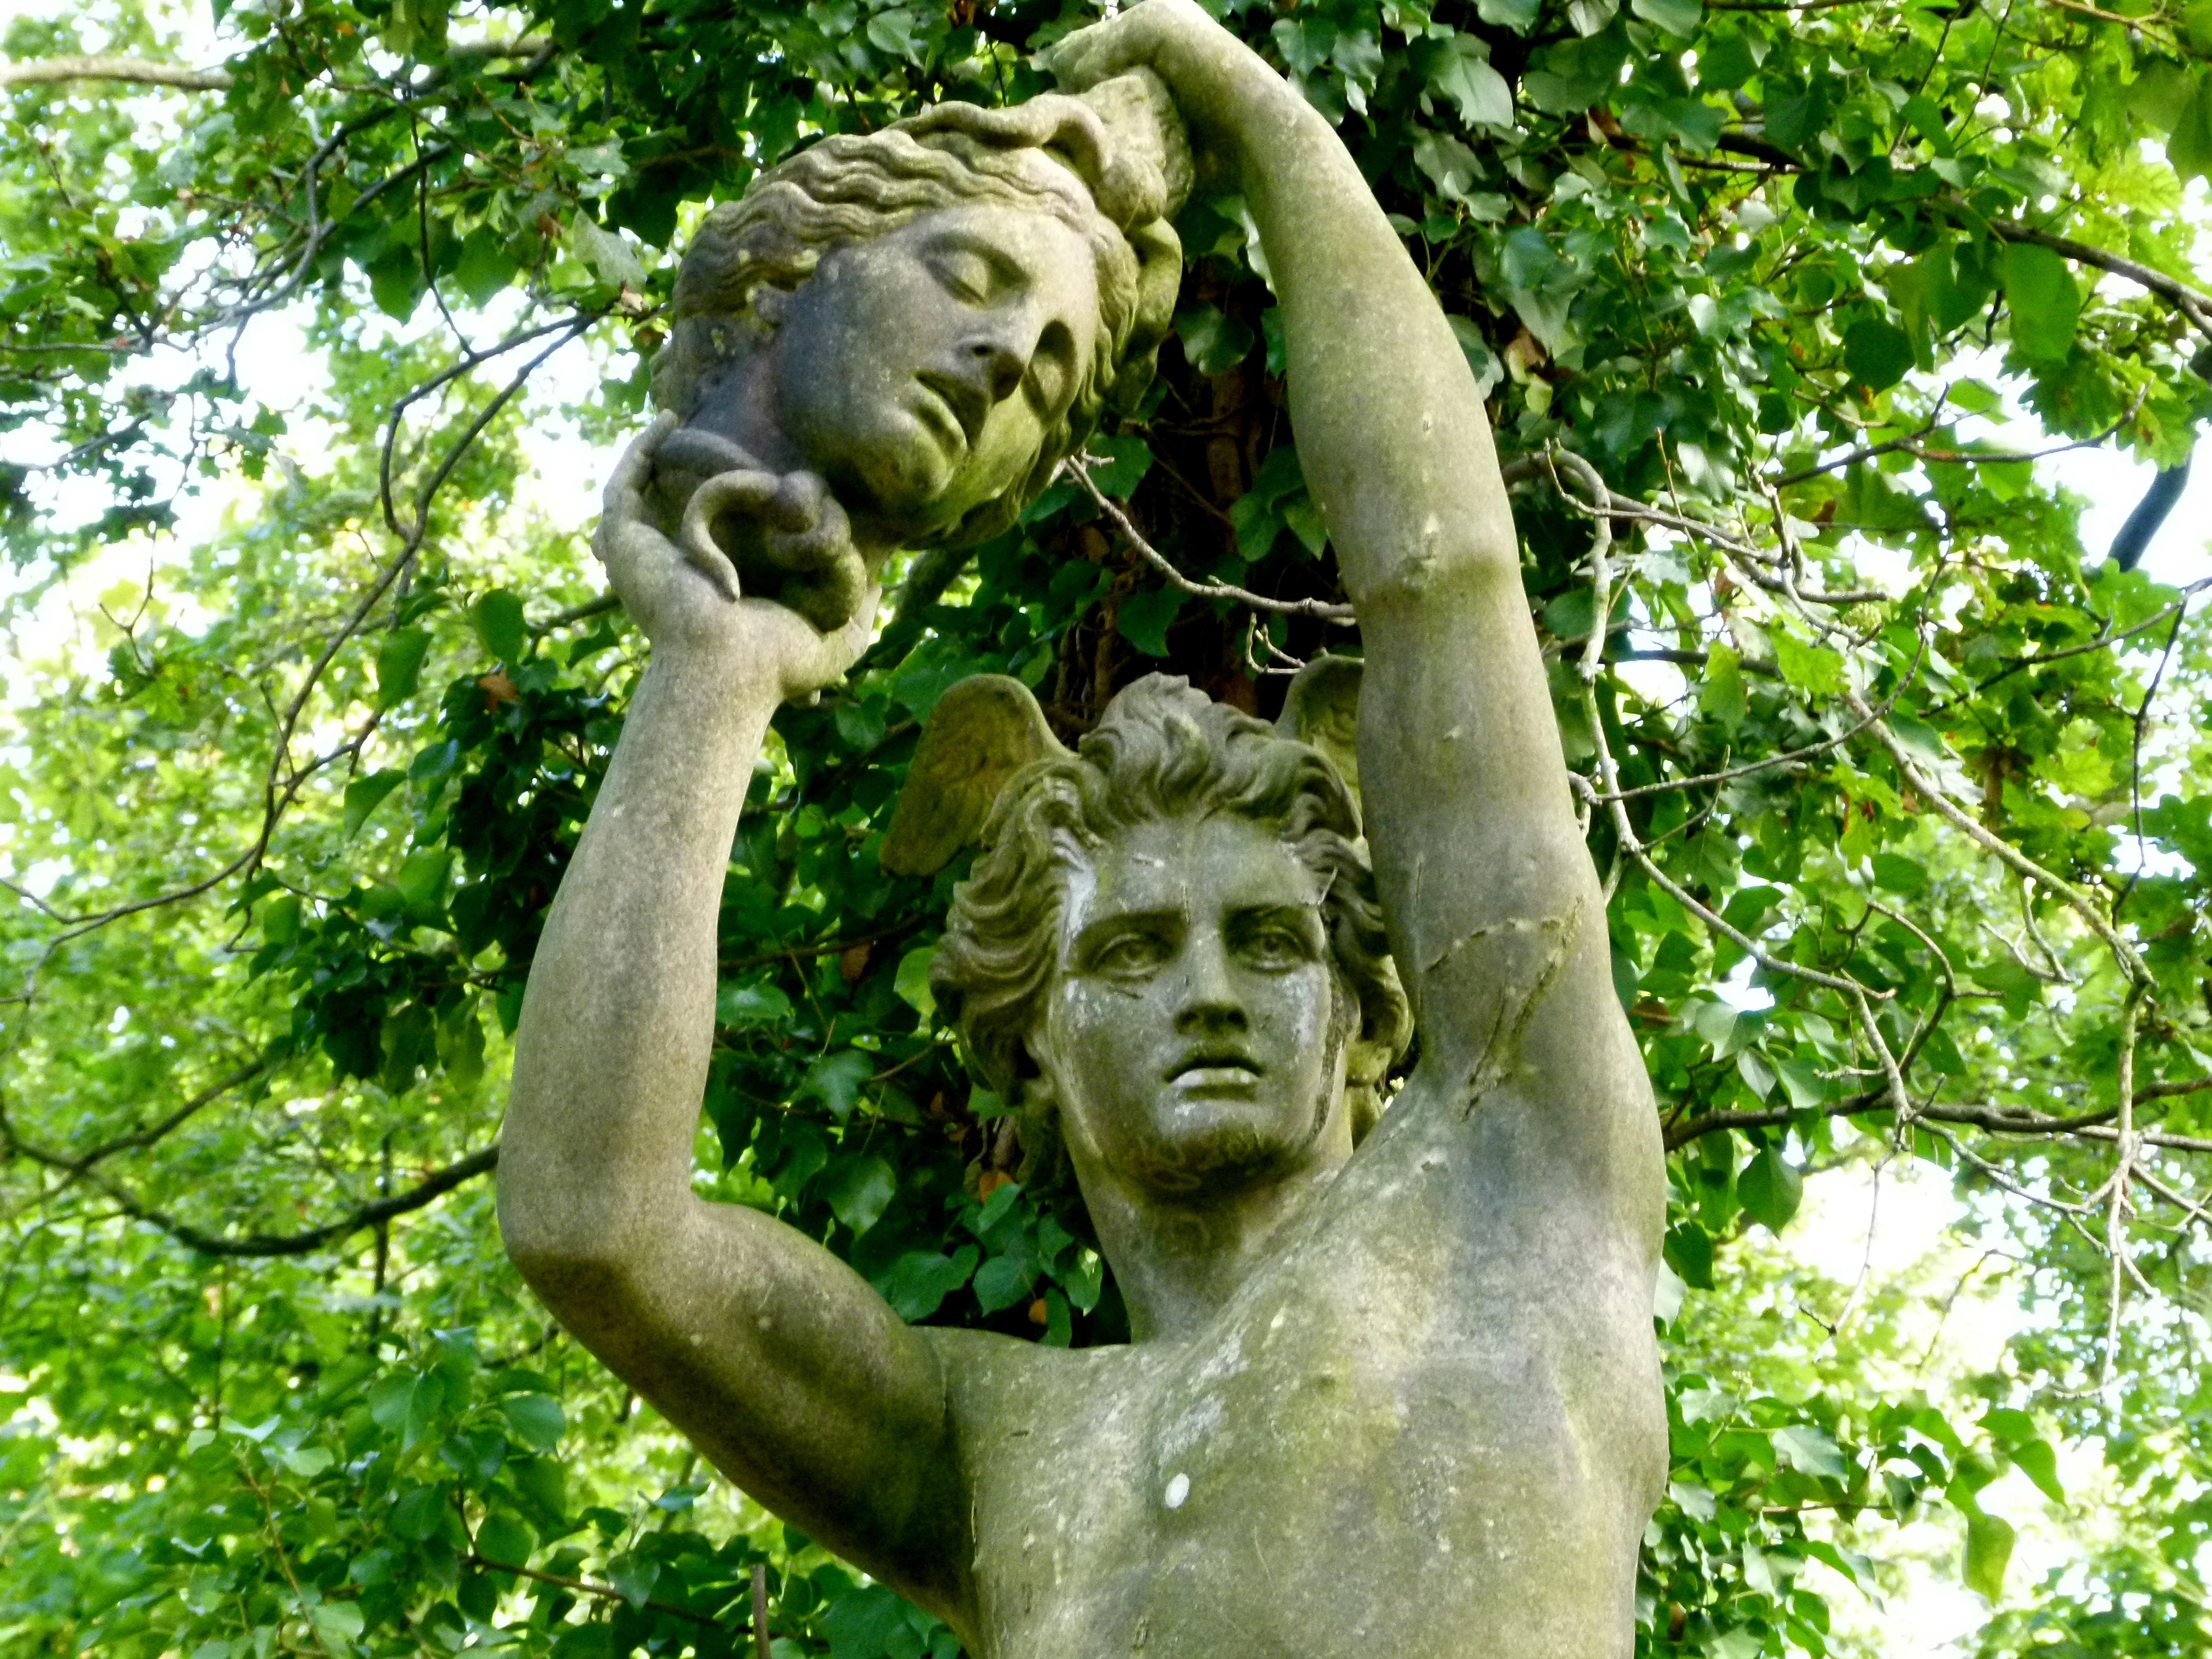 Sculpture metal jardin 20171003210405 - Sculpture metal jardin ...